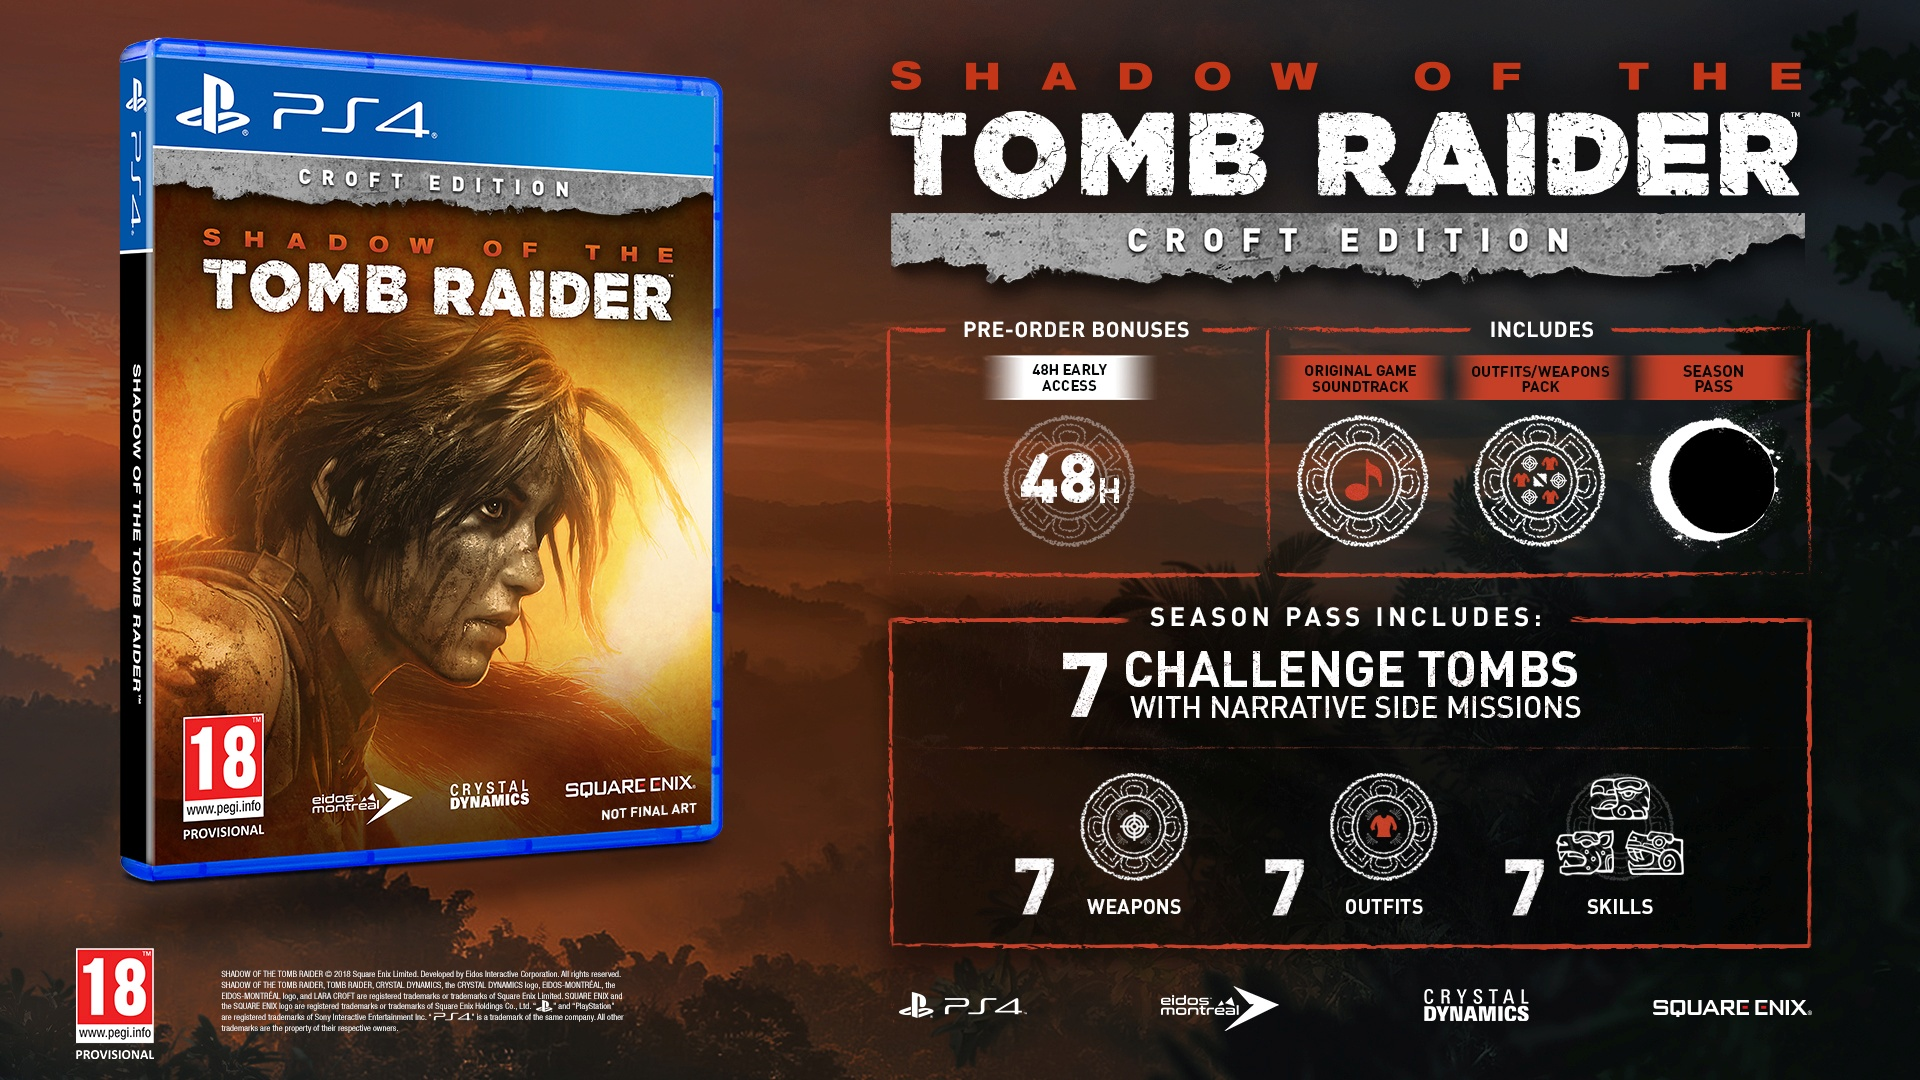 V Shadow of the Tomb Raider bude Lara zachraňovat svět před mayskou apokalypsou Shadow of the Tomb Raider Croft edition